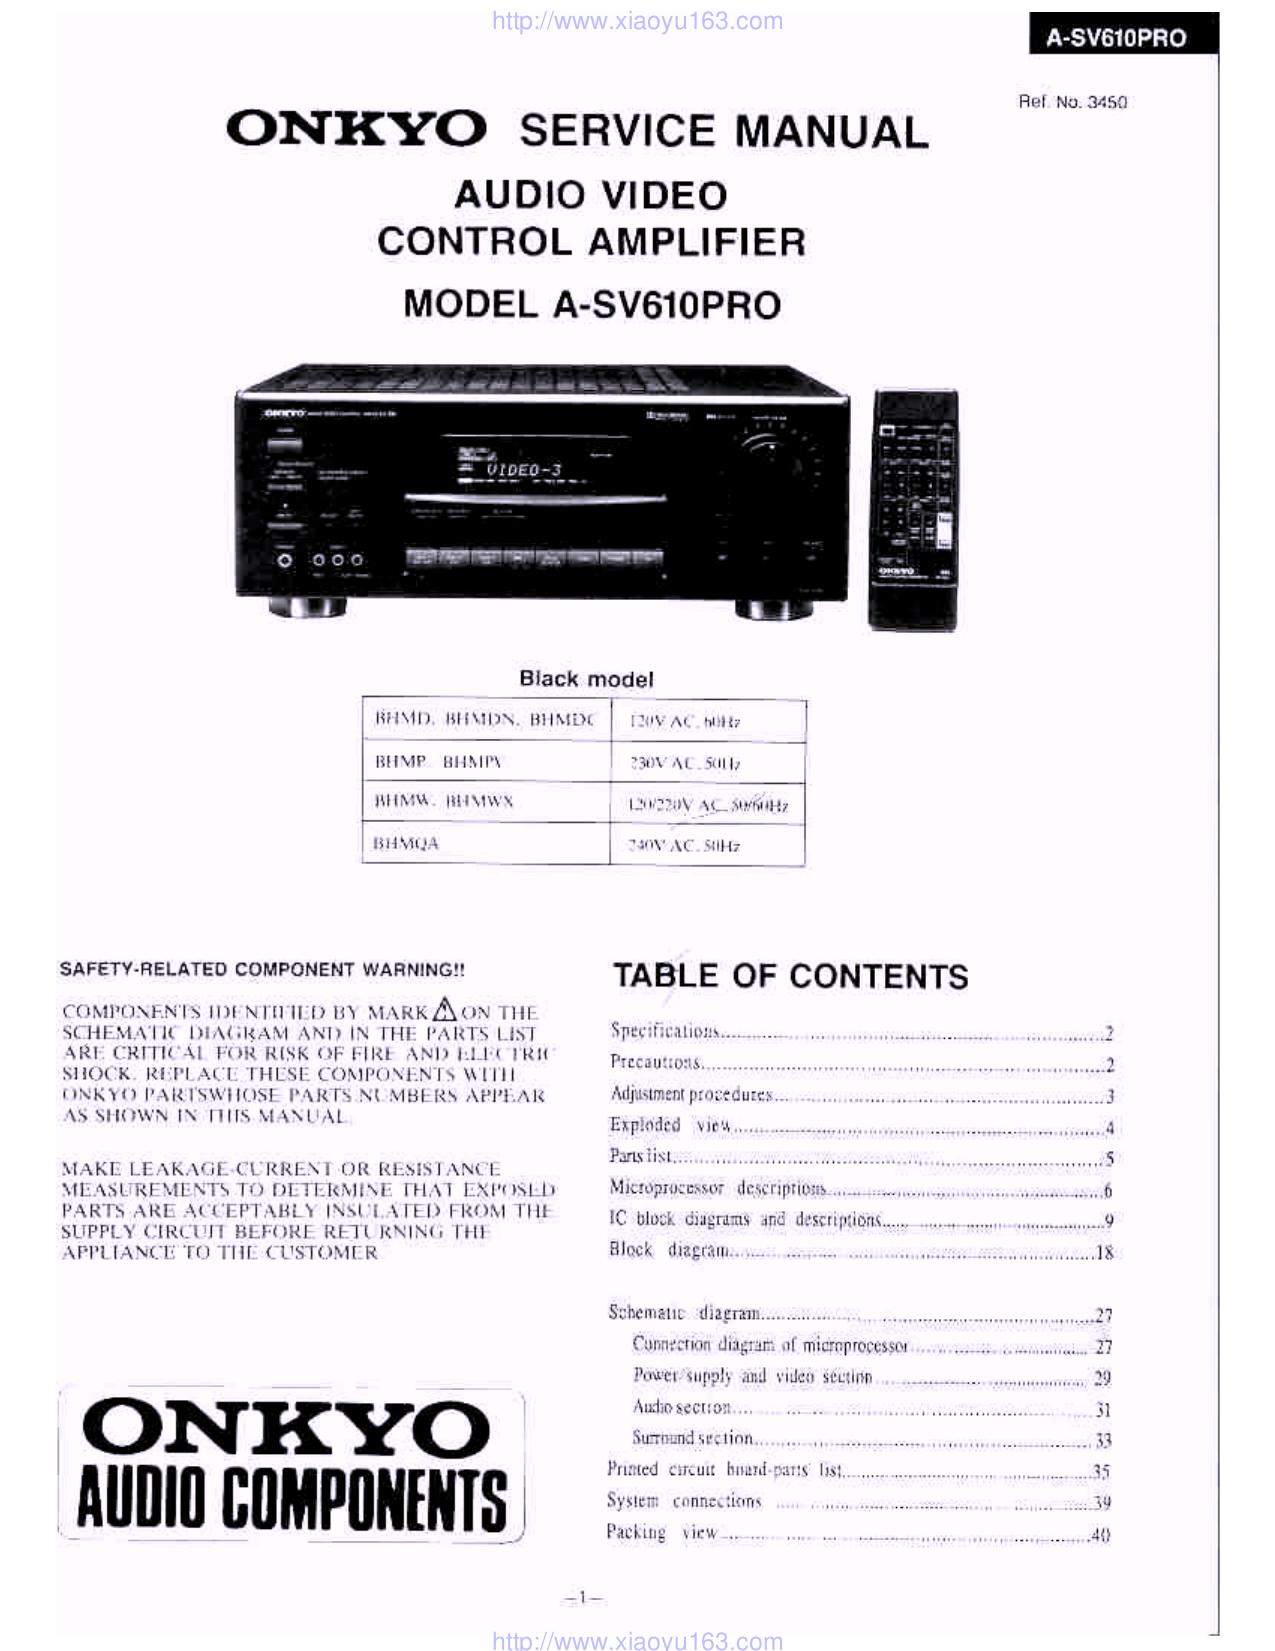 download free pdf for onkyo tx sv636 receiver manual rh umlib com Onkyo TX SR501 Onkyo TX SR501